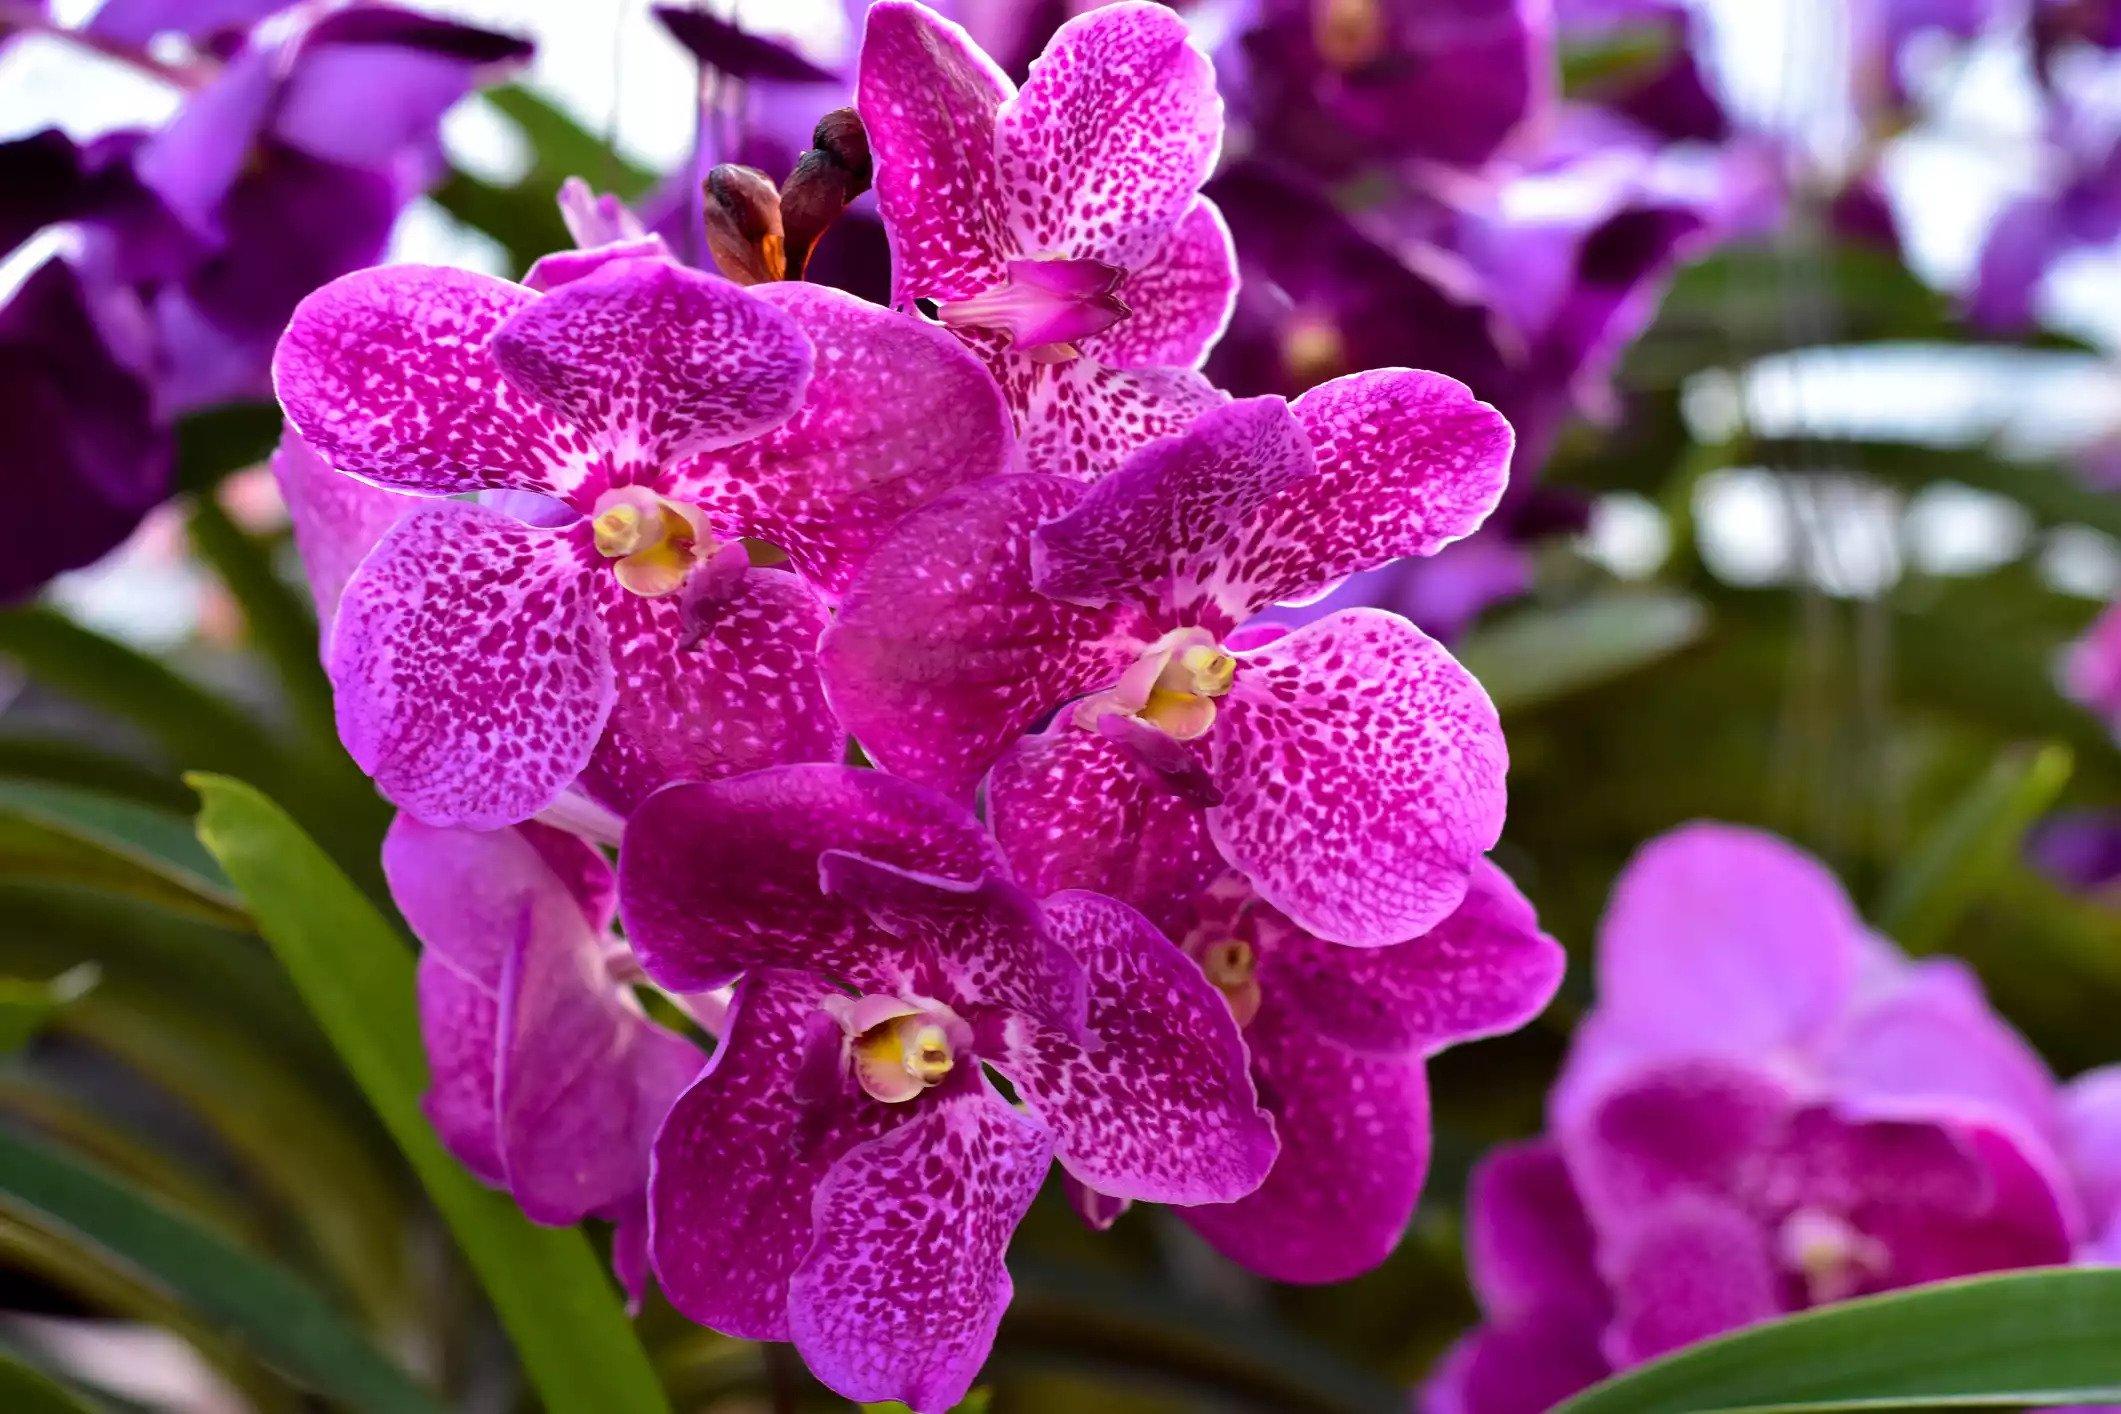 گل ارکیده Vanda Orchids